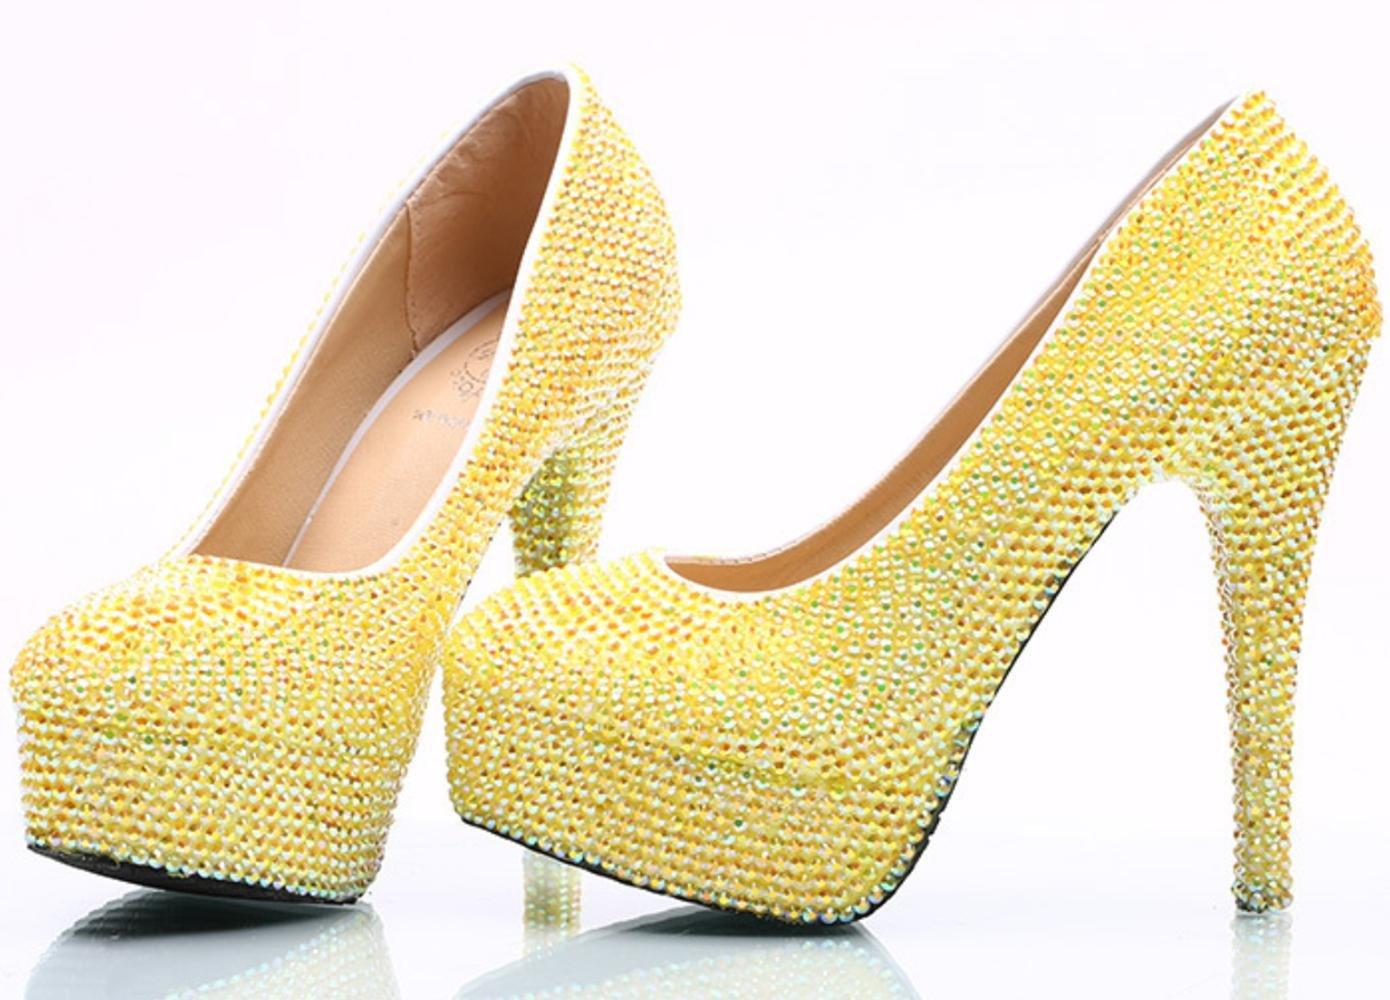 c3b13b4f61e Amazon.com   YCMDM Women Big Size Wedding Shoes Diamond Bride Shoes Lemon  Yellow Drill Stiletto Heel High Shallow Mouth Shoes Nightclub